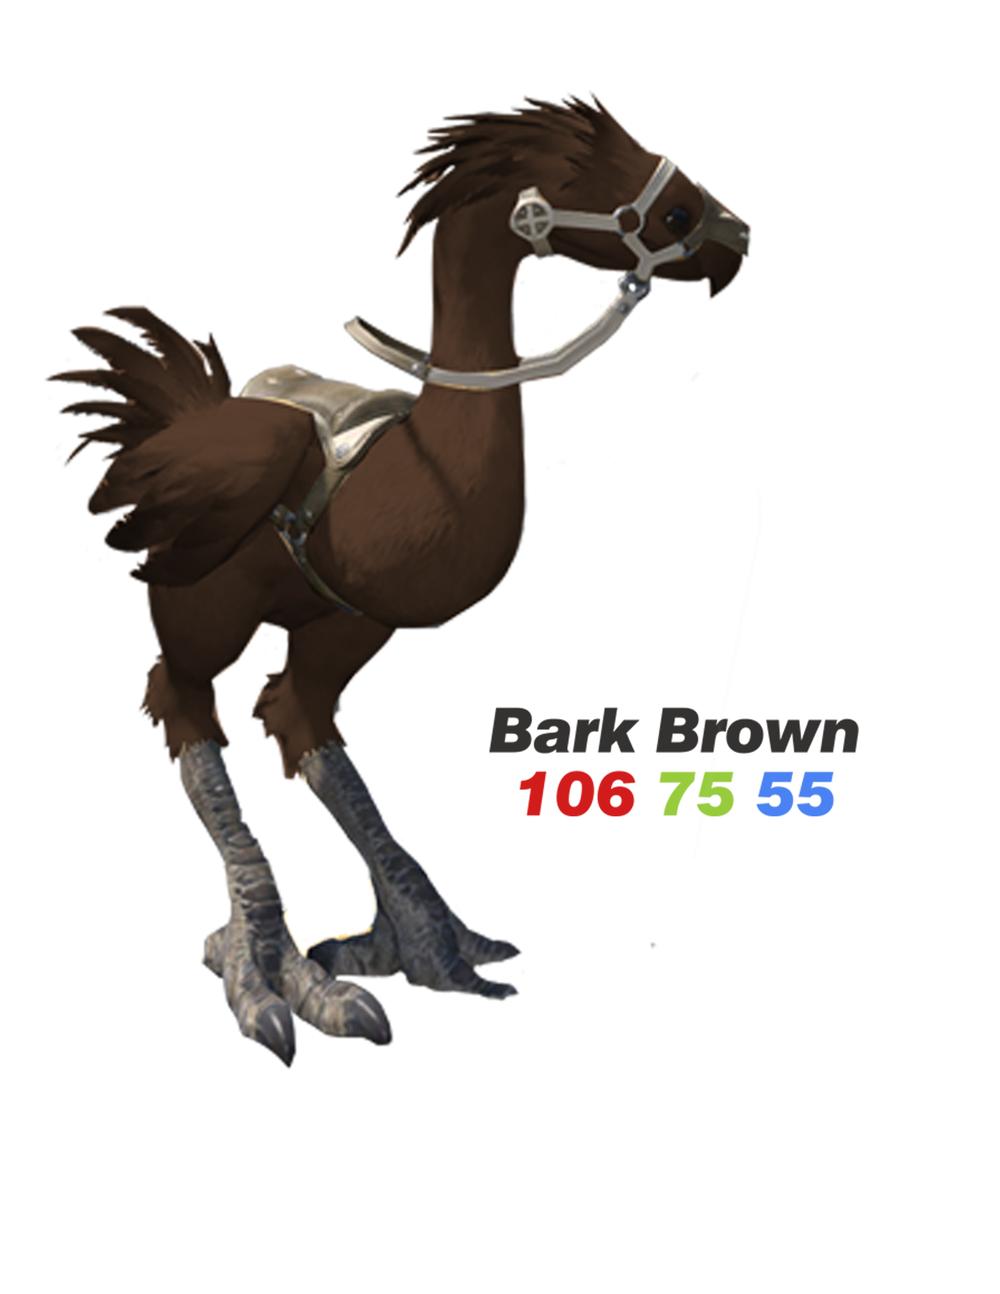 BardBrown.png